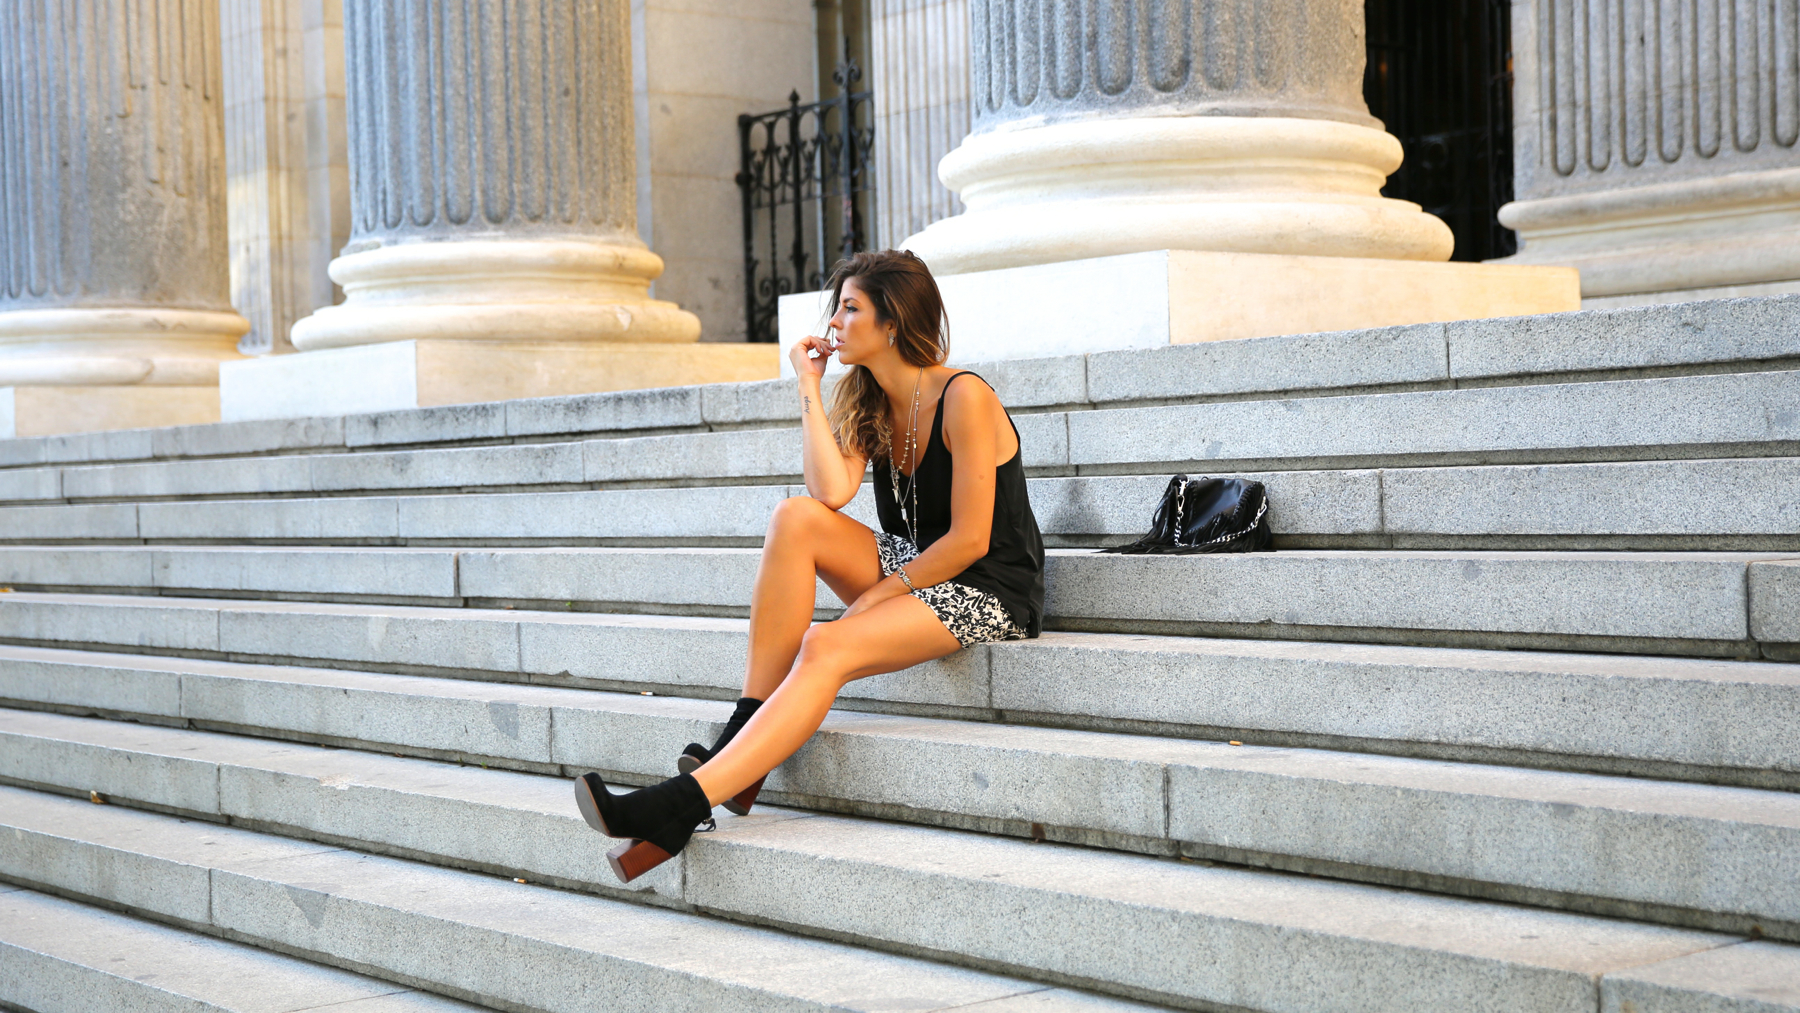 trendy_taste-look-outfit-street_style-ootd-blog-blogger-fashion_spain-moda_españa-animal_print-boho-casual-falda-skirt-black_booties-botines_negros-jeffrey_campbell-zara-bolso_flecos-vintage-6